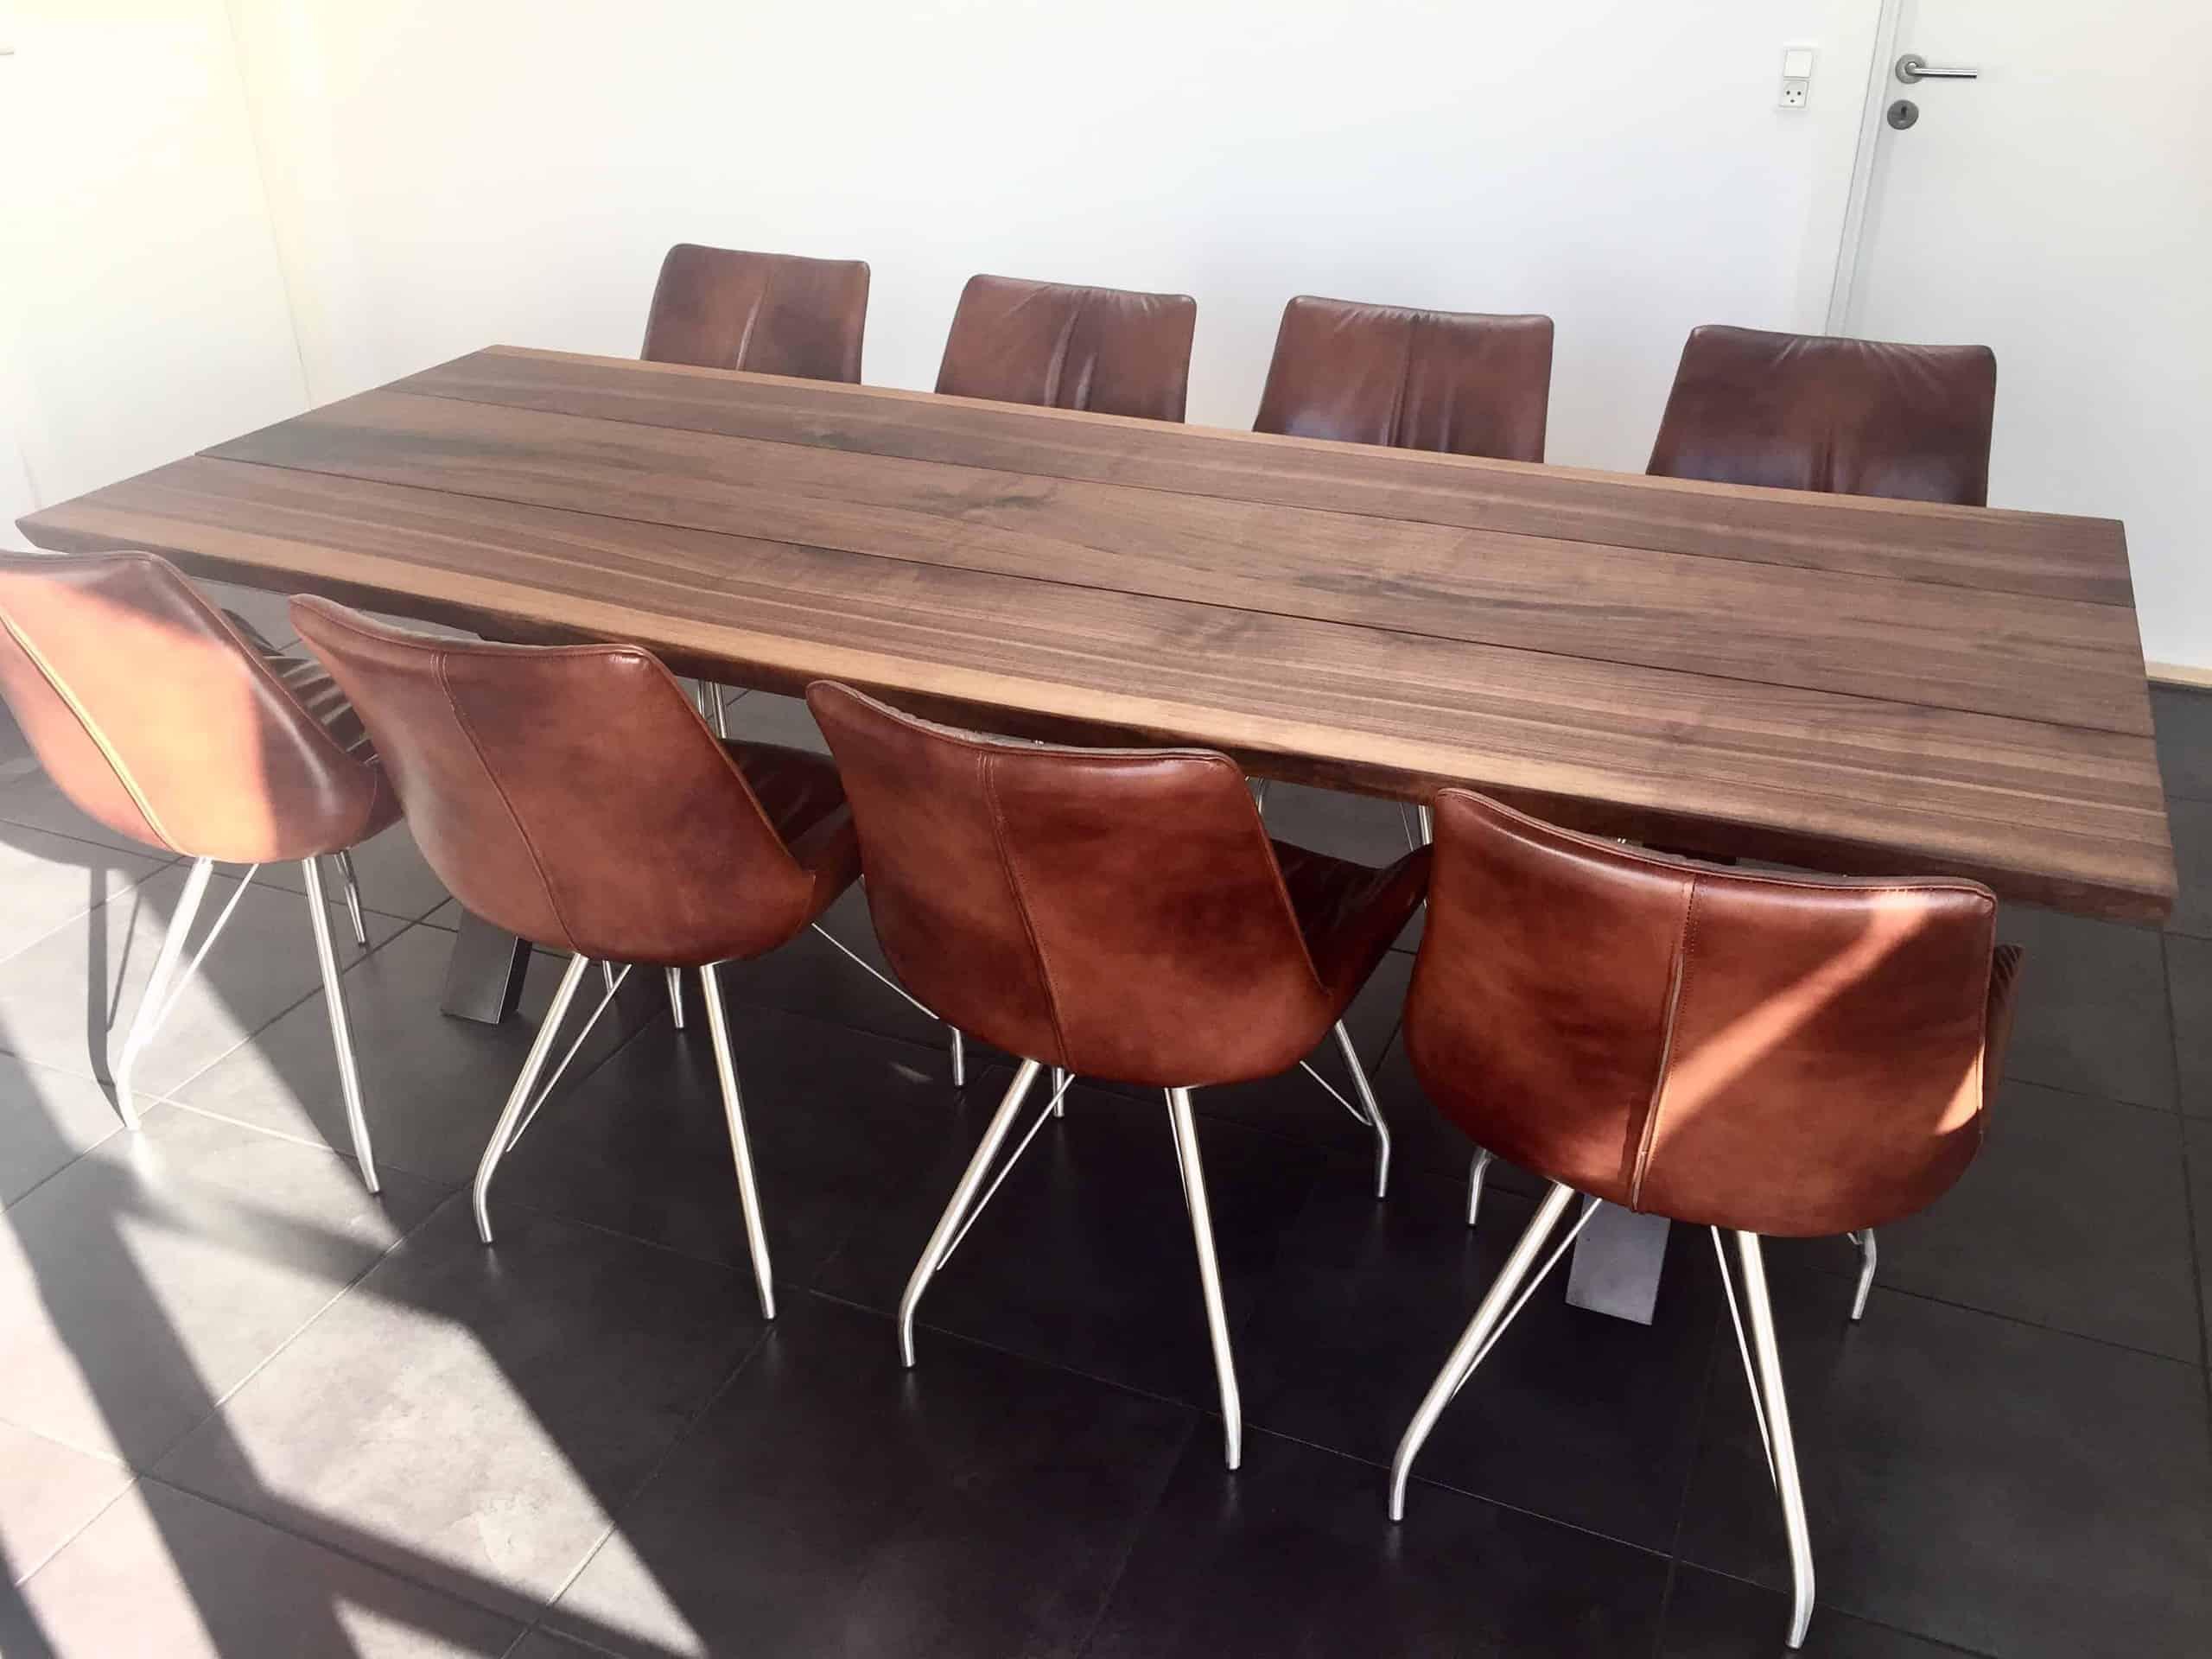 valnoeddebord 04 valnoeddebord 04 1 - Valnødsbord med stole i natur olie